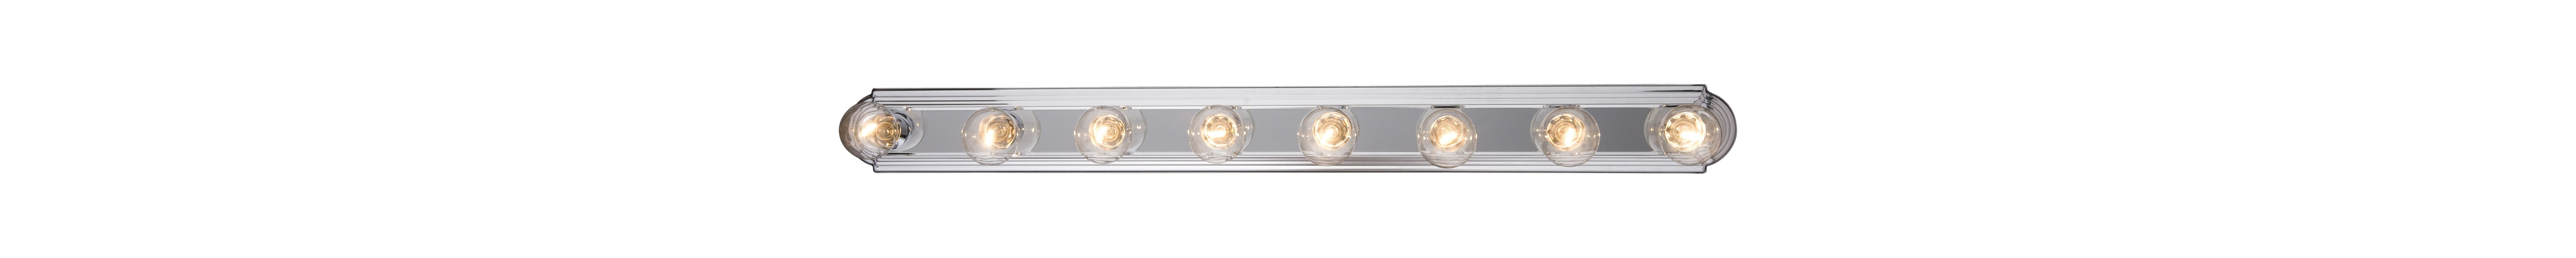 "Maxim 7128 8 Light 48"" Wide Bathroom Fixture from the Essentials -"